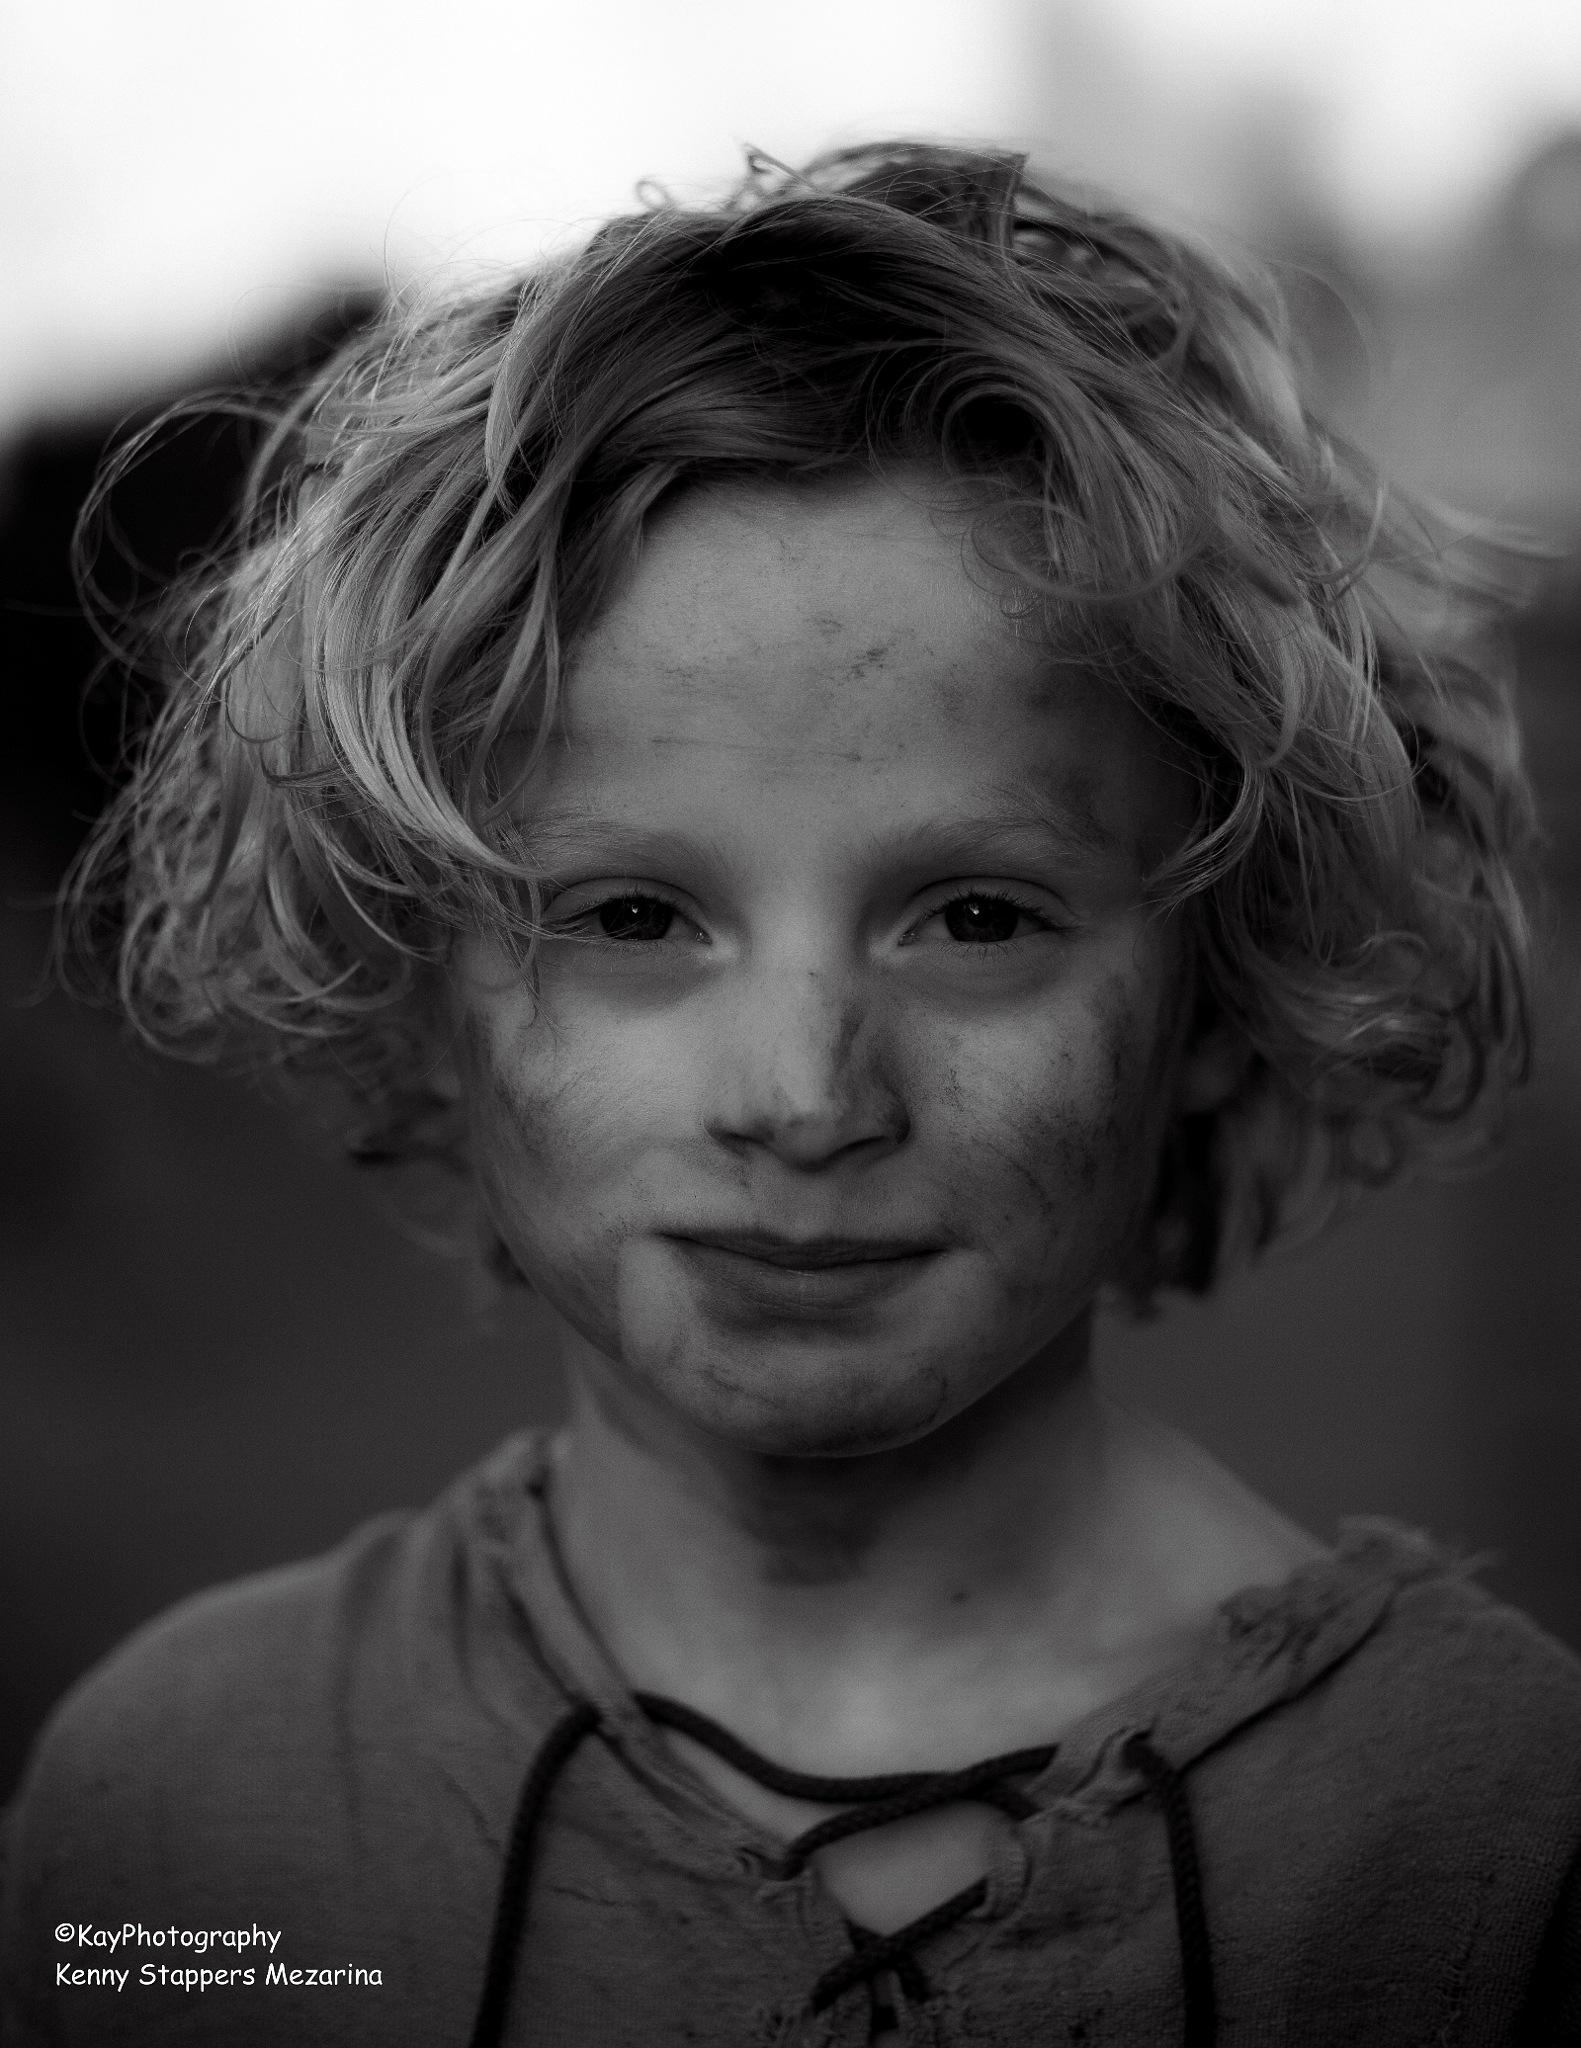 innocent child by kennystappersmezarina